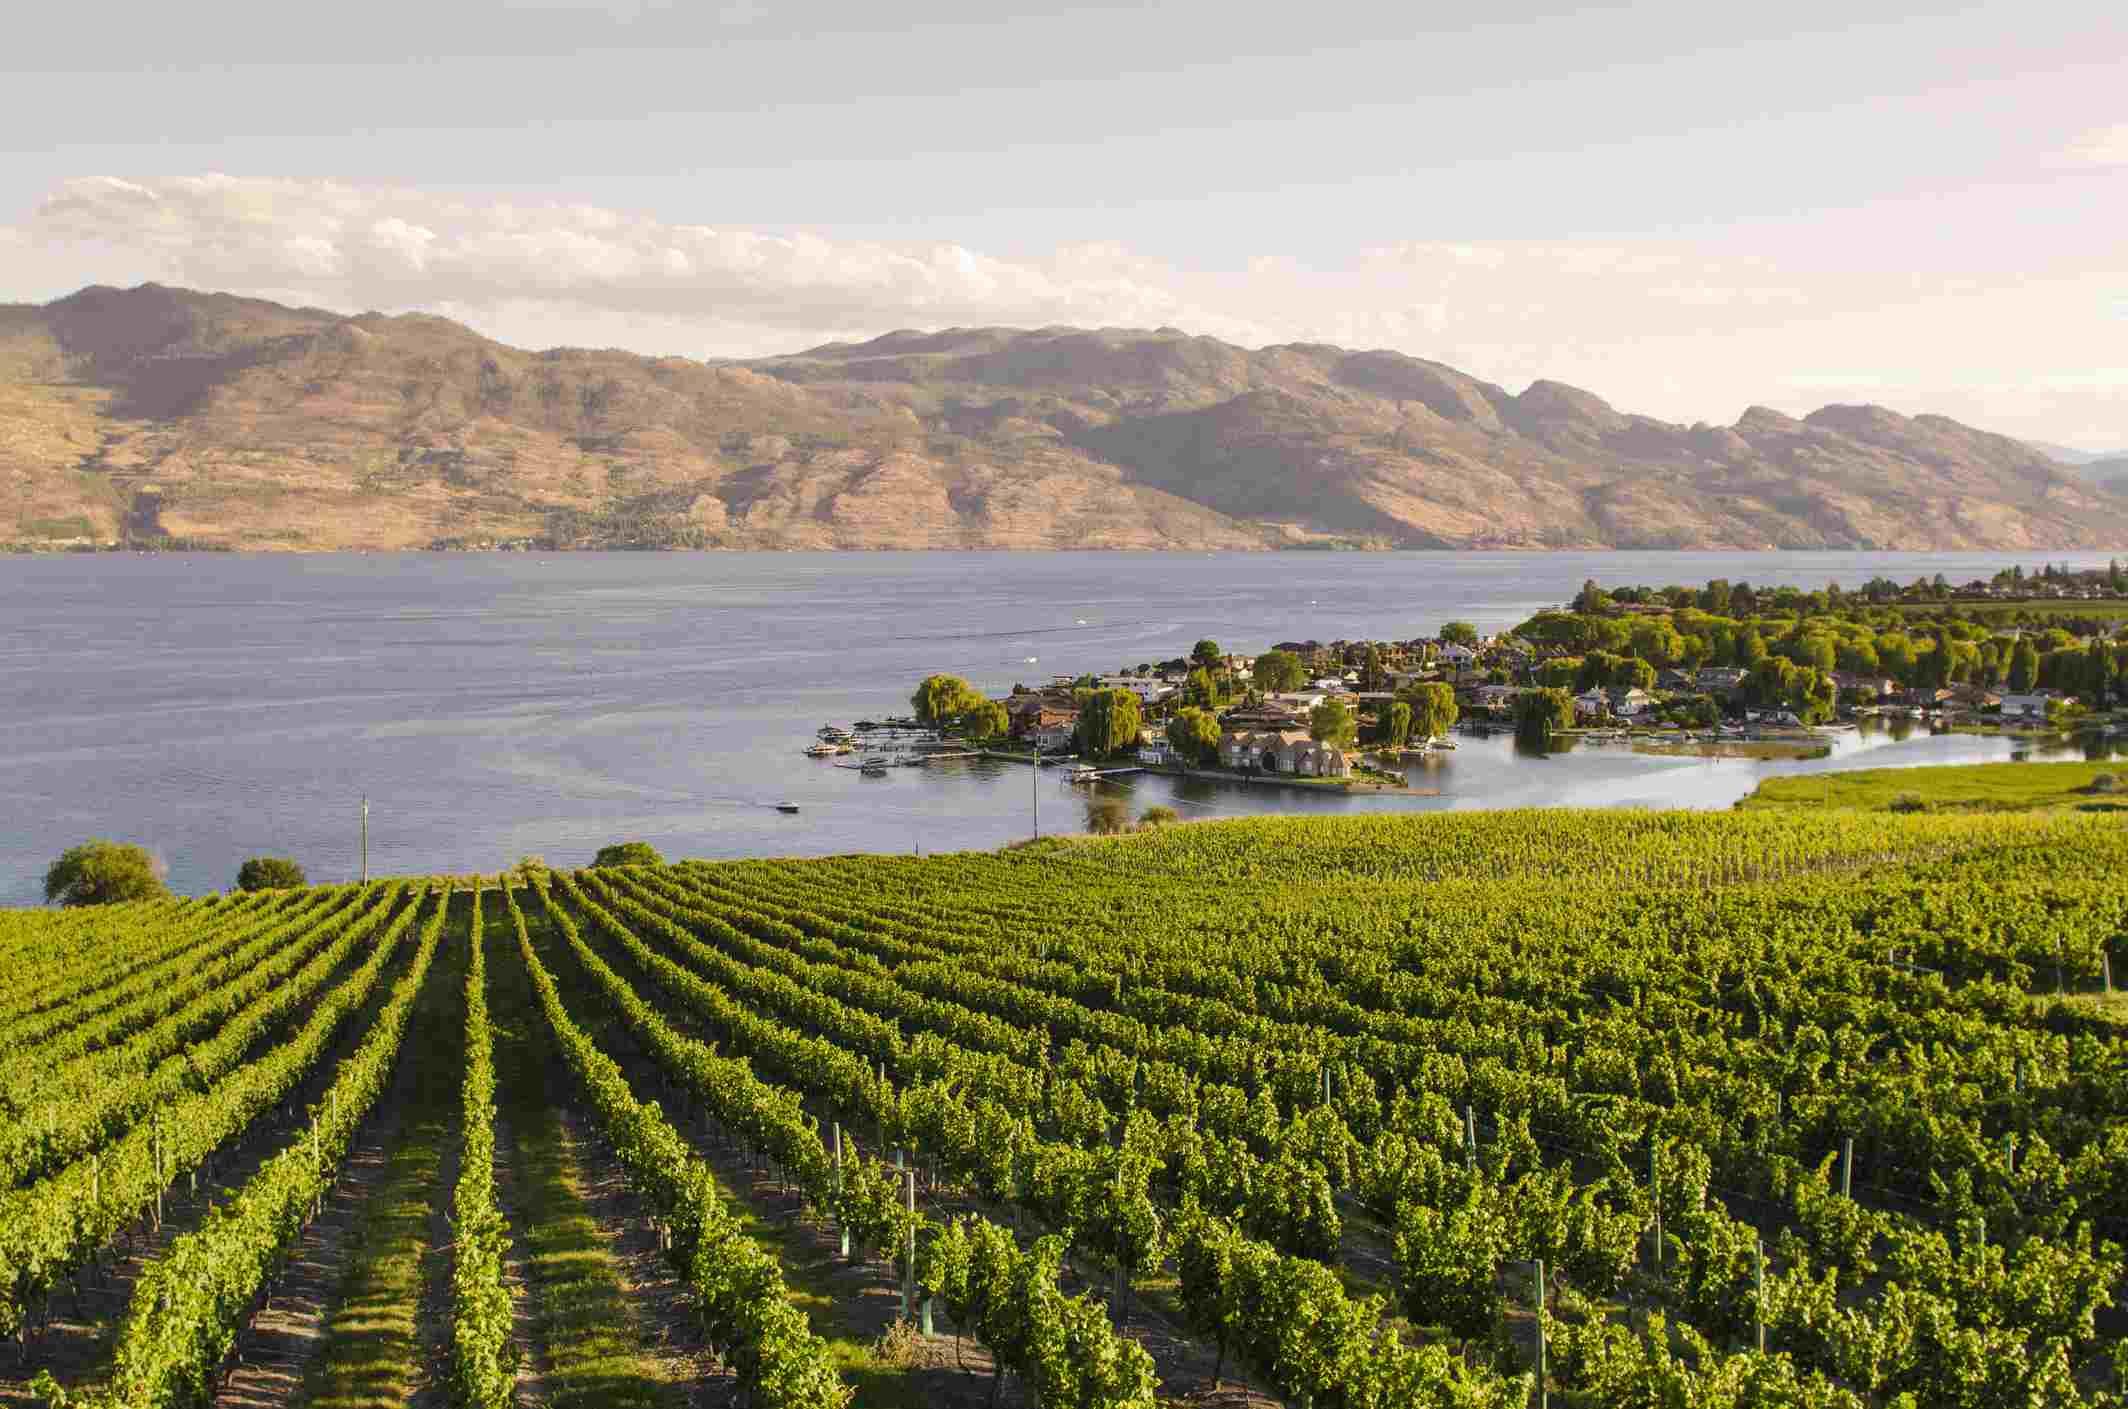 Grape vines and Okanagan Lake at Quails Gate Winery, Kelowna, British Columbia, Canada, North America